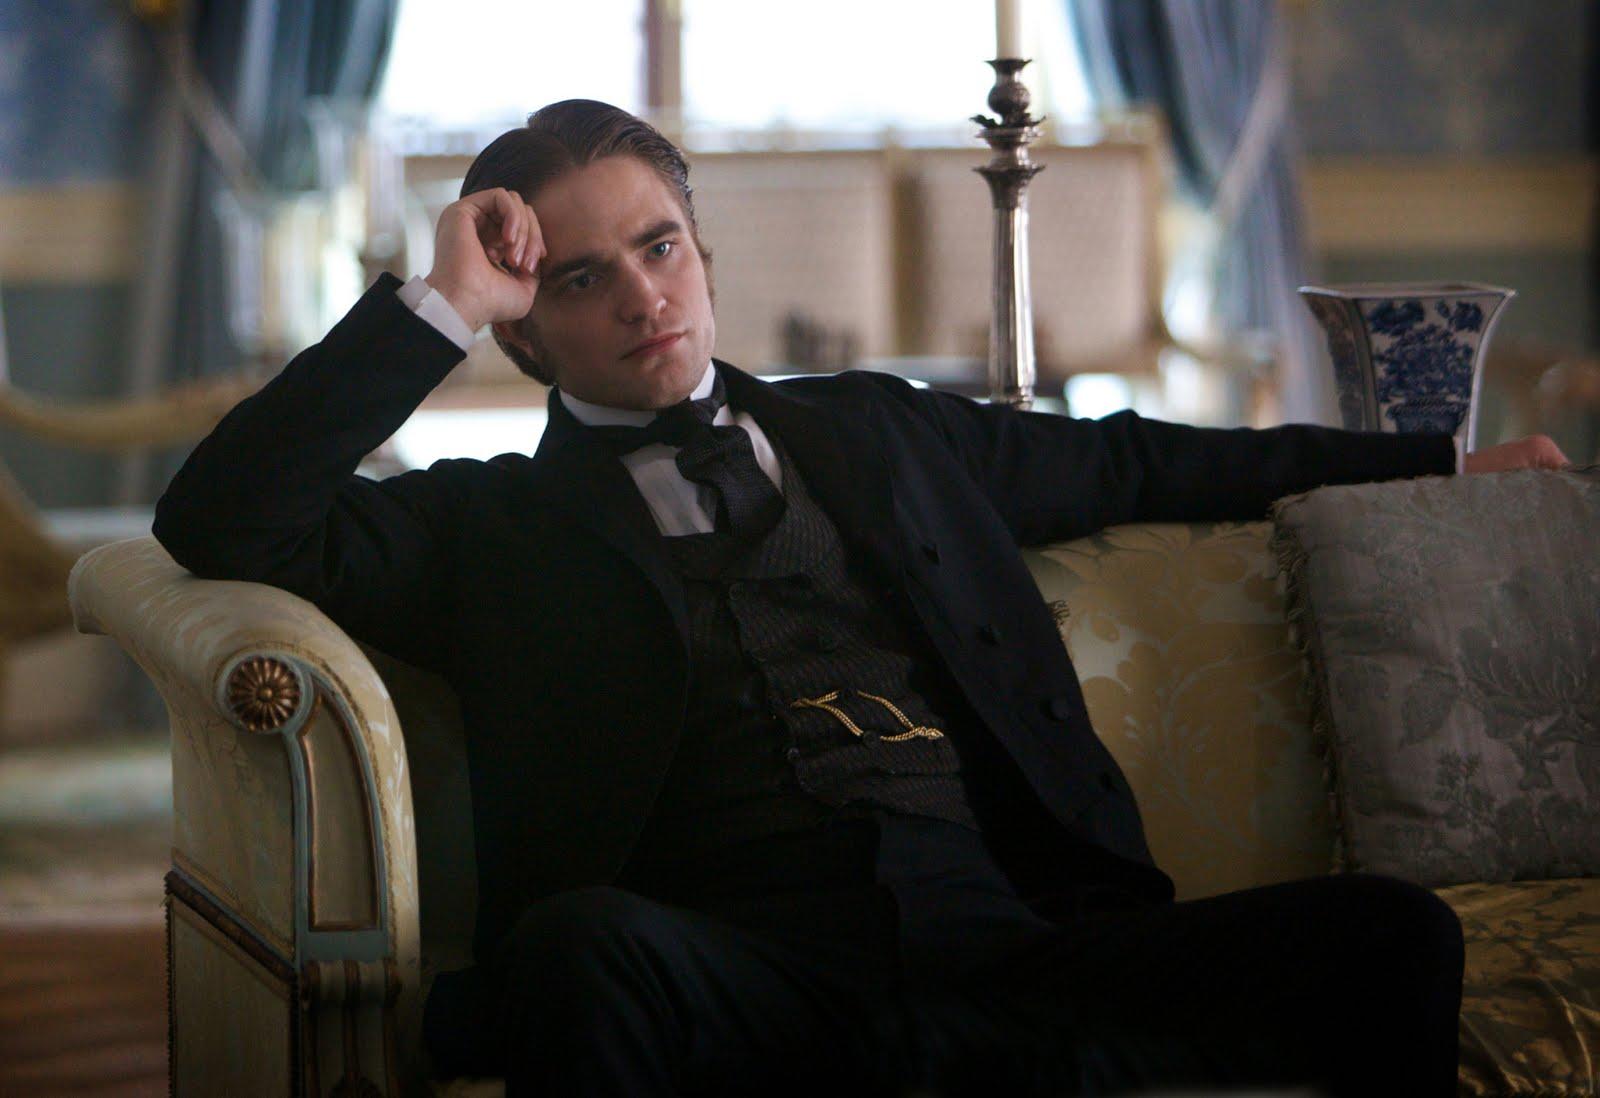 Robert Pattinson - Bel Ami